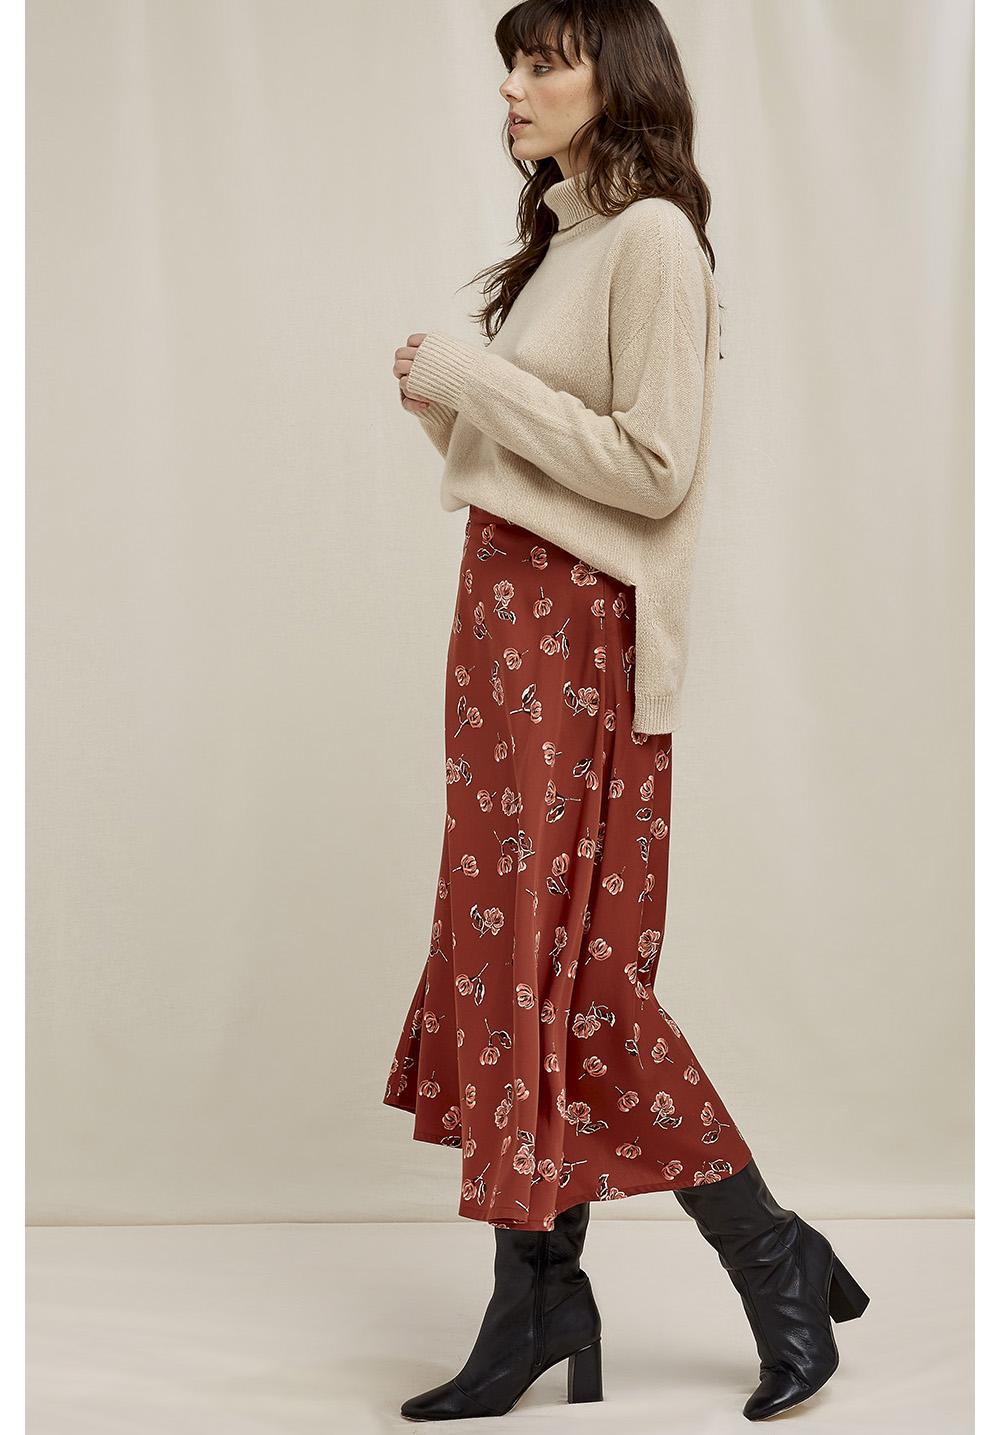 Alison Floral Midi Skirt 10